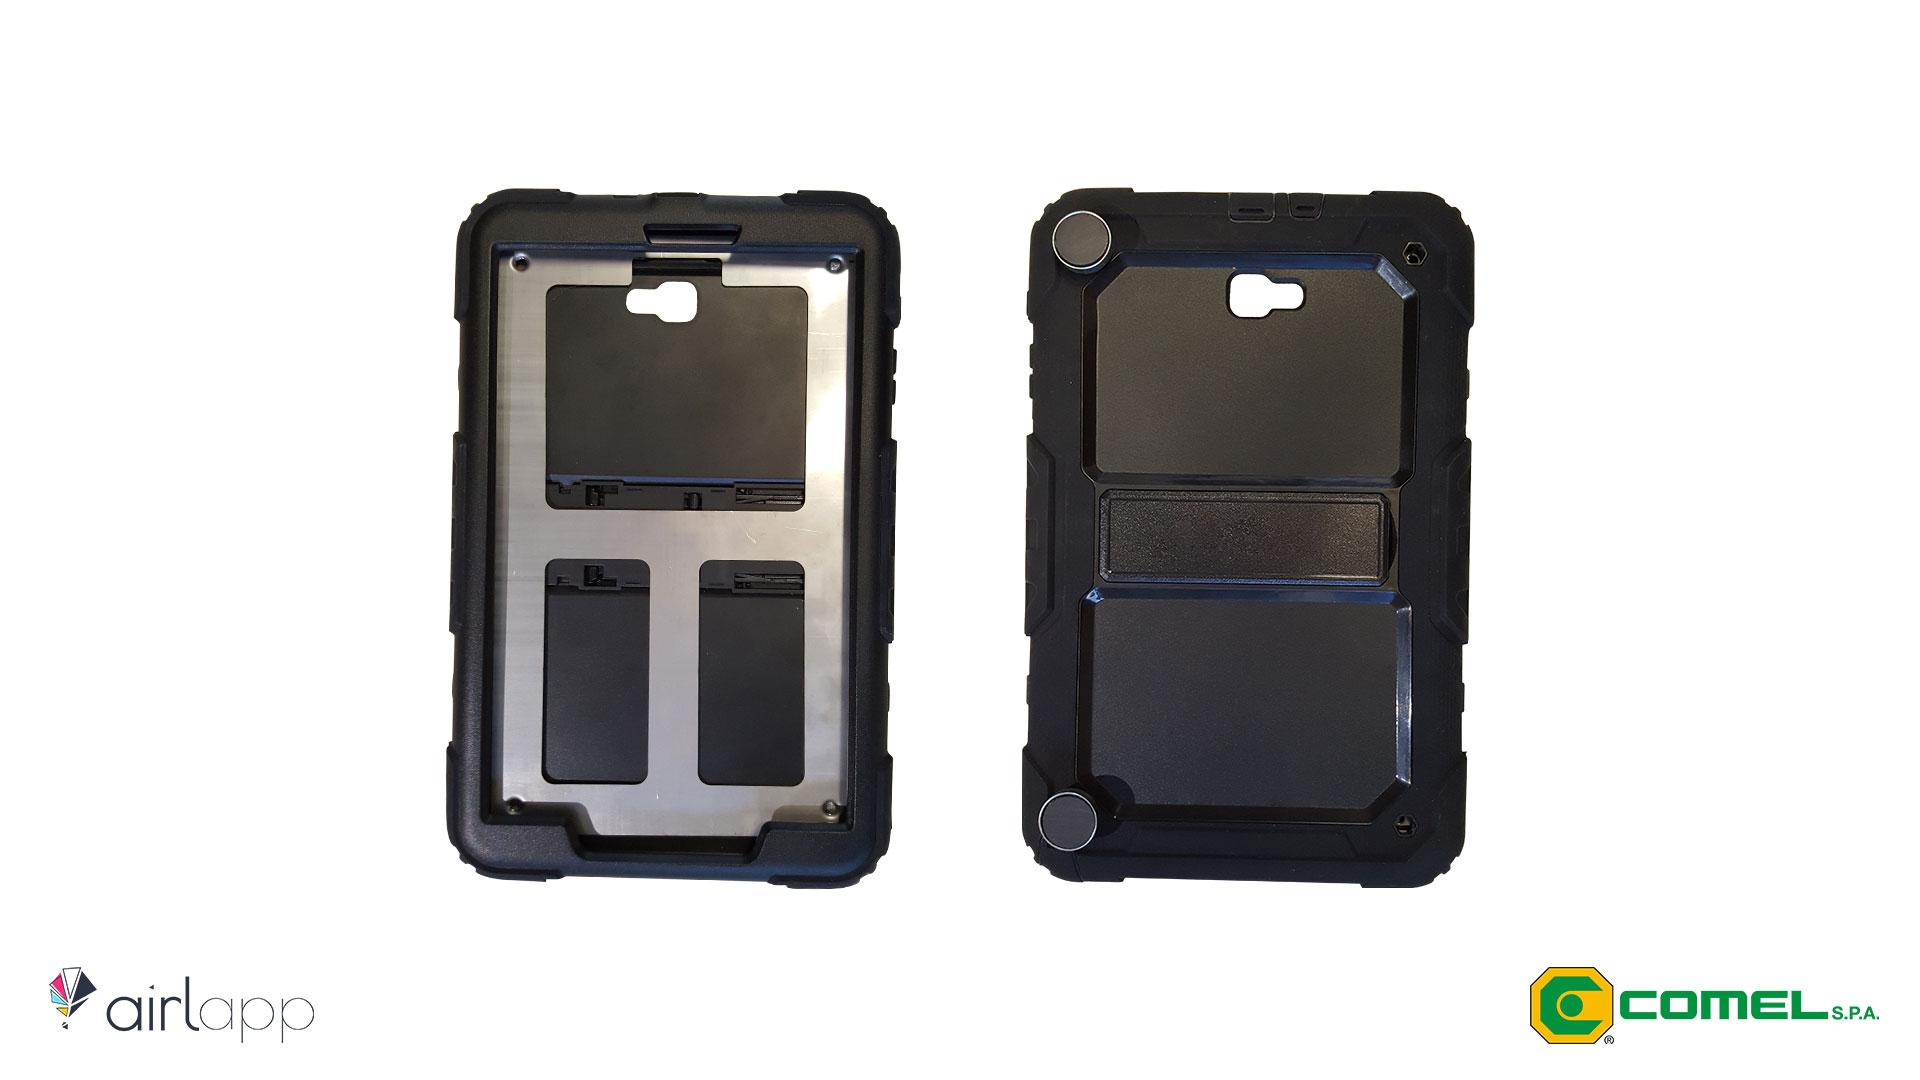 Tablet case per Comel - Paperless - Airlapp